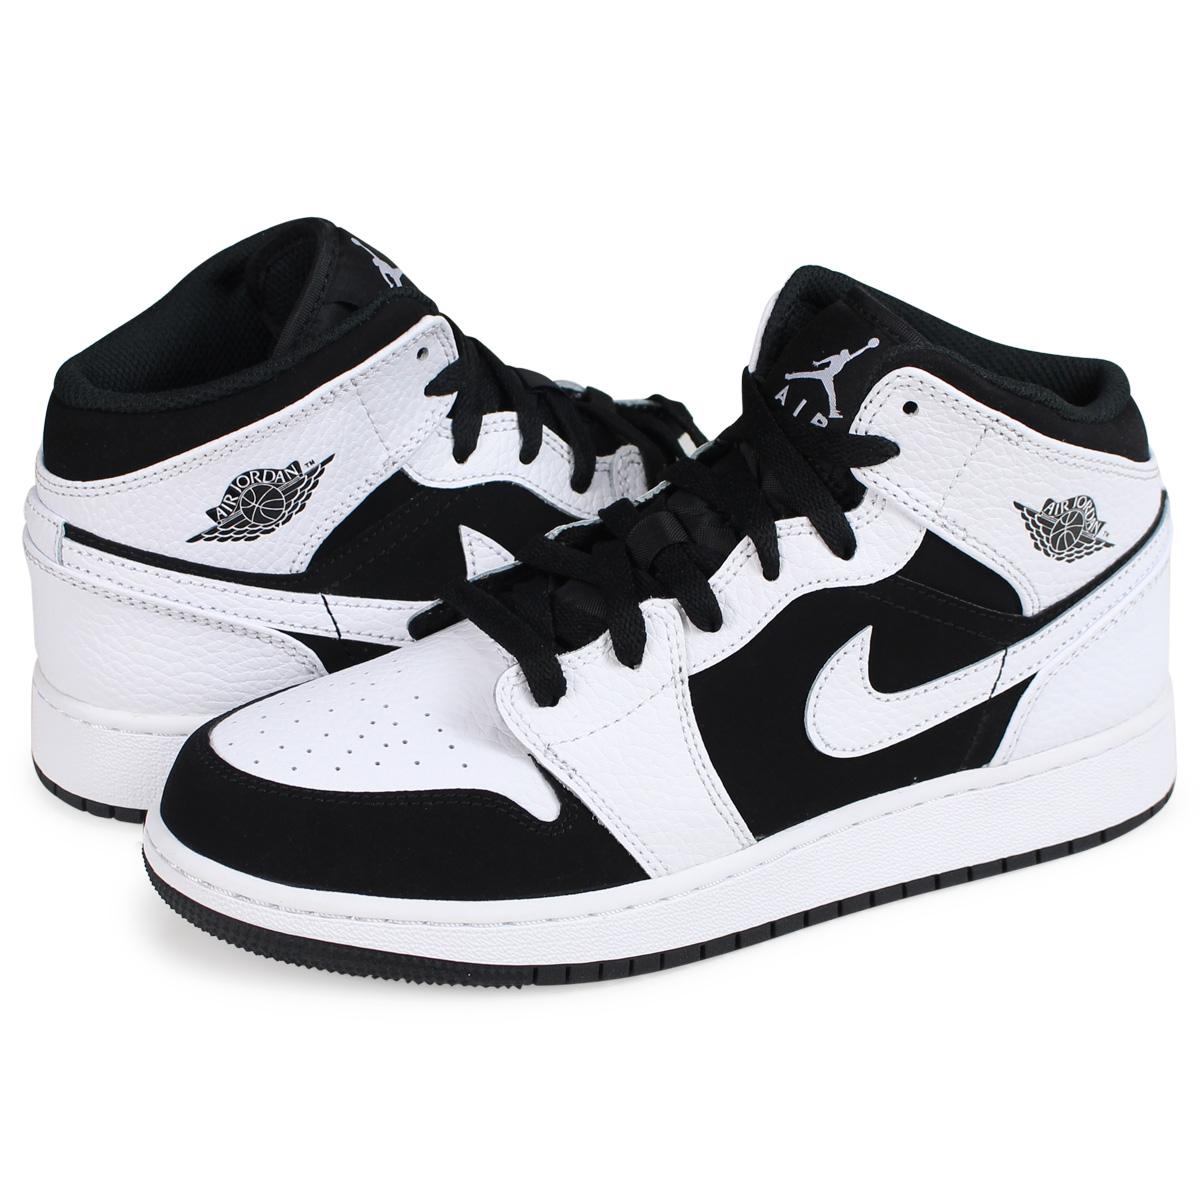 a9299ddbd133  brand NIKE getting high popularity from sneakers freak . Air Jordan 1 ...